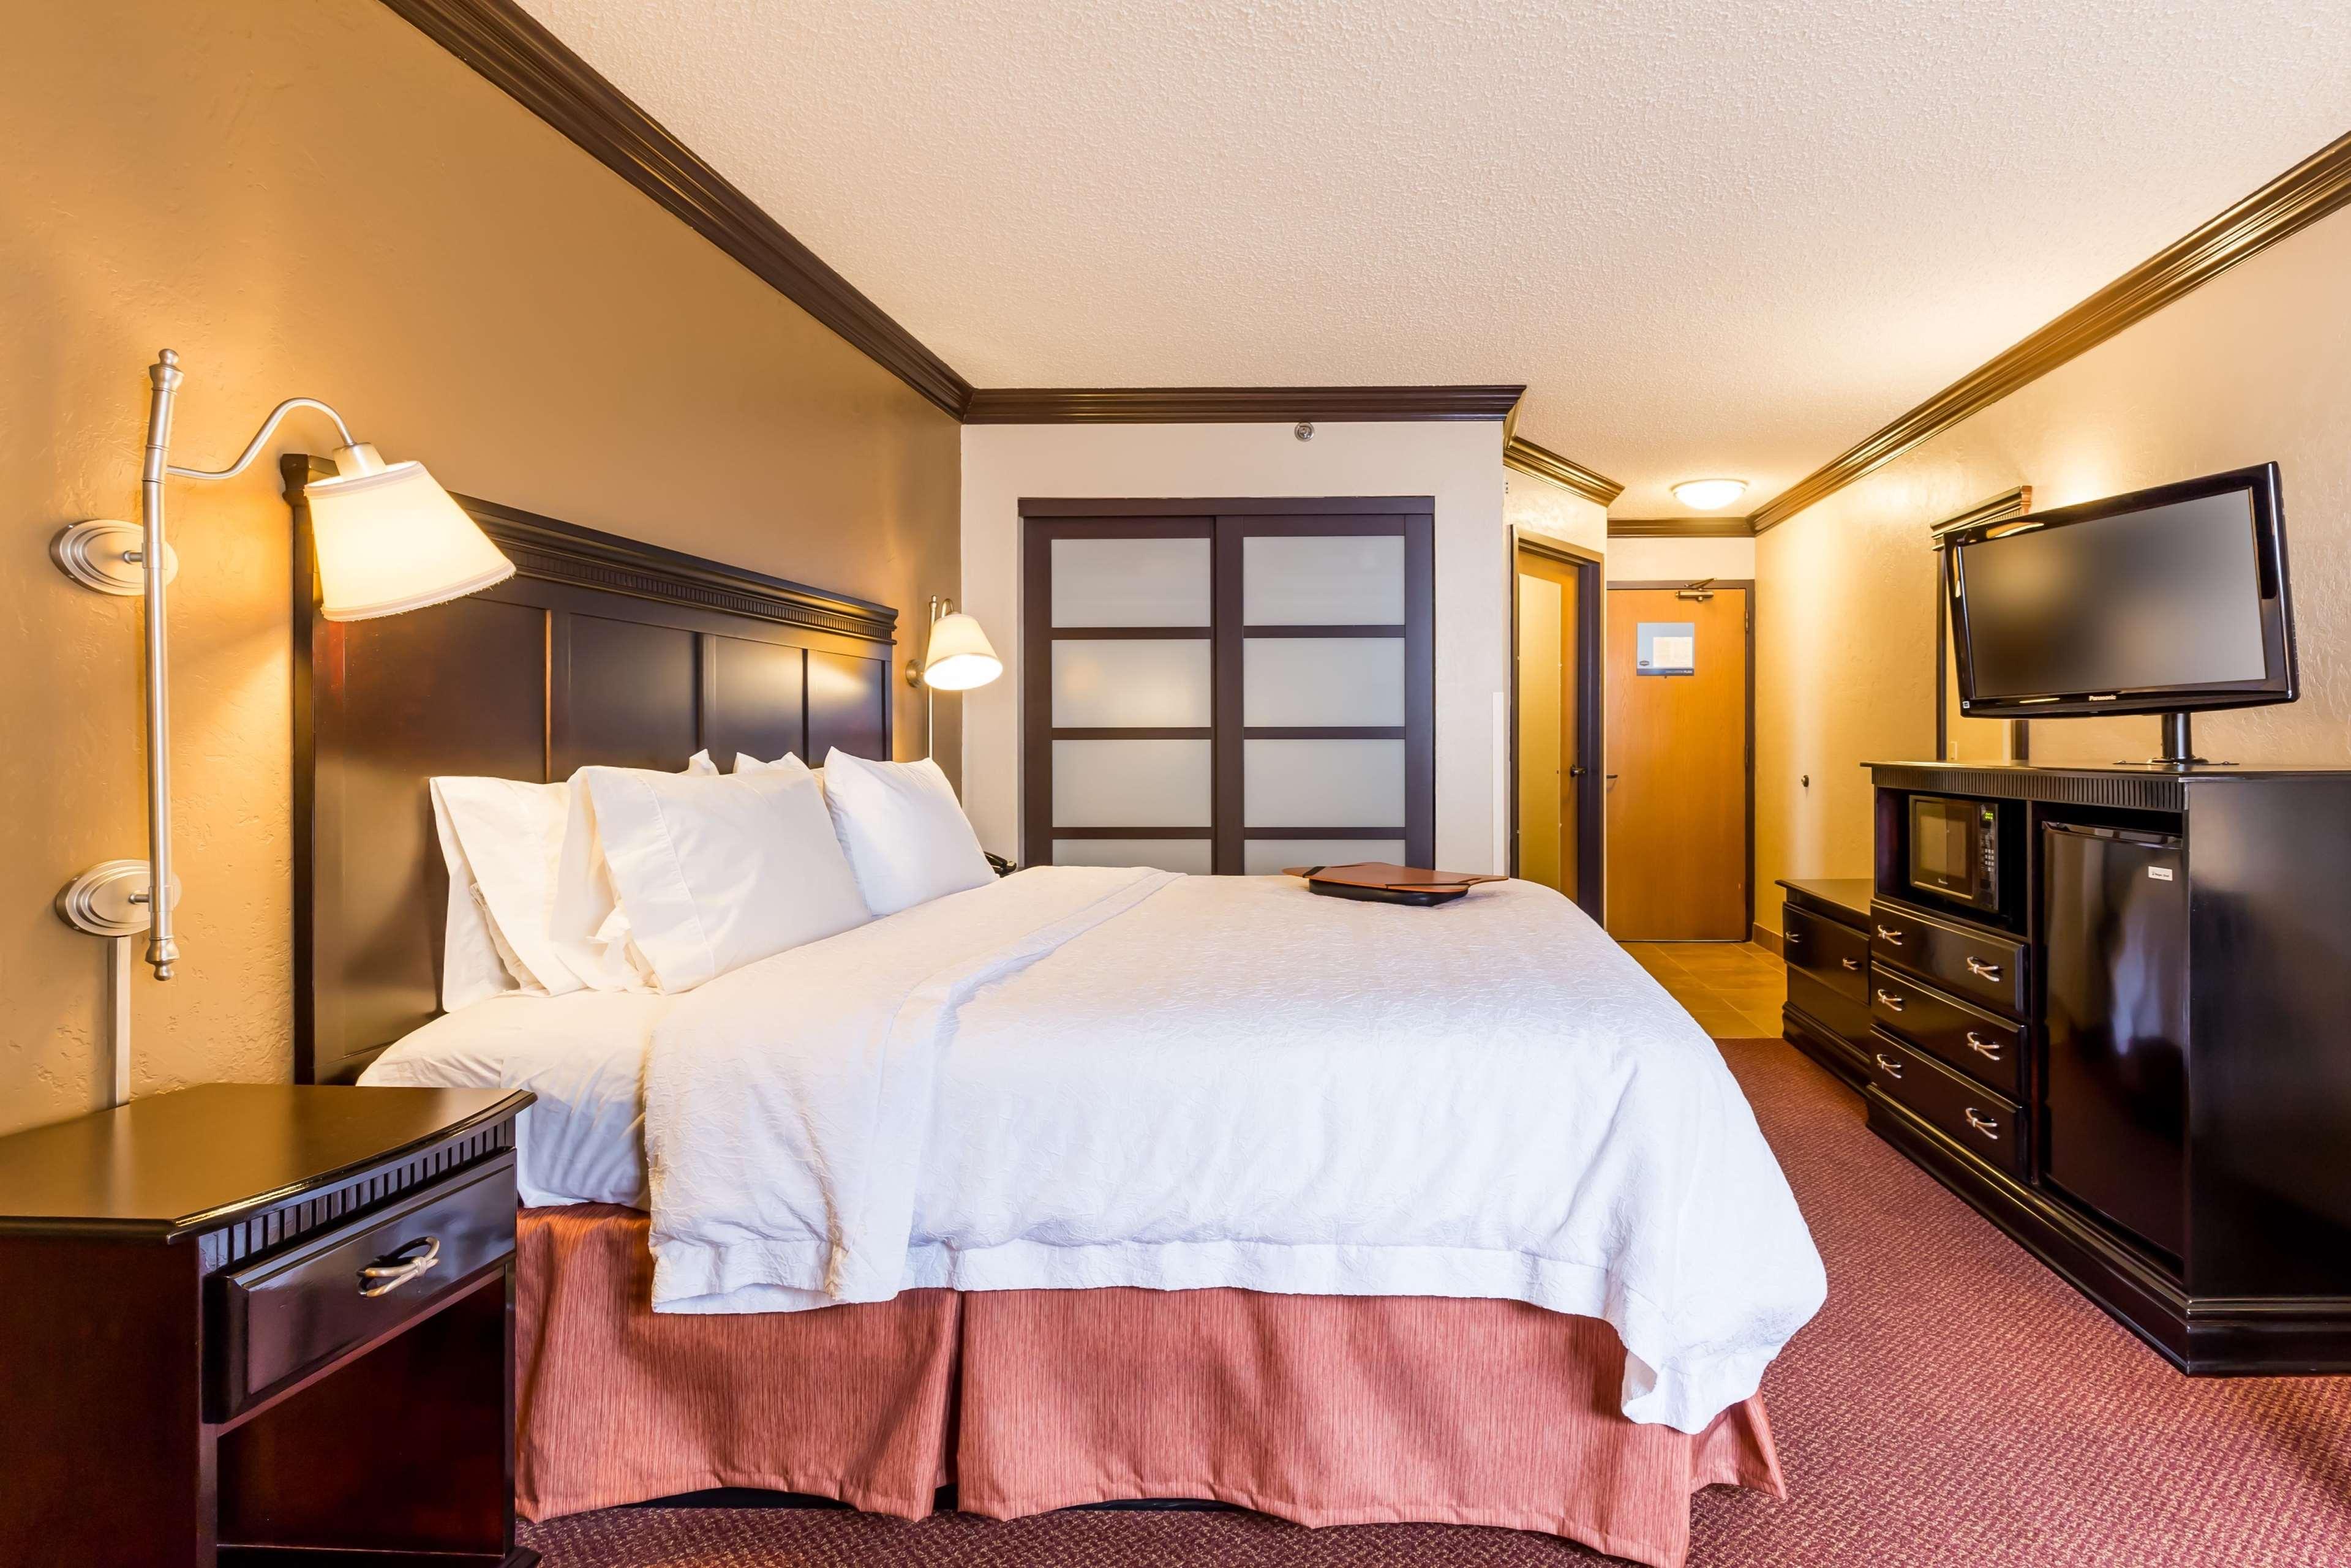 Hampton Inn & Suites Chicago/Hoffman Estates image 46